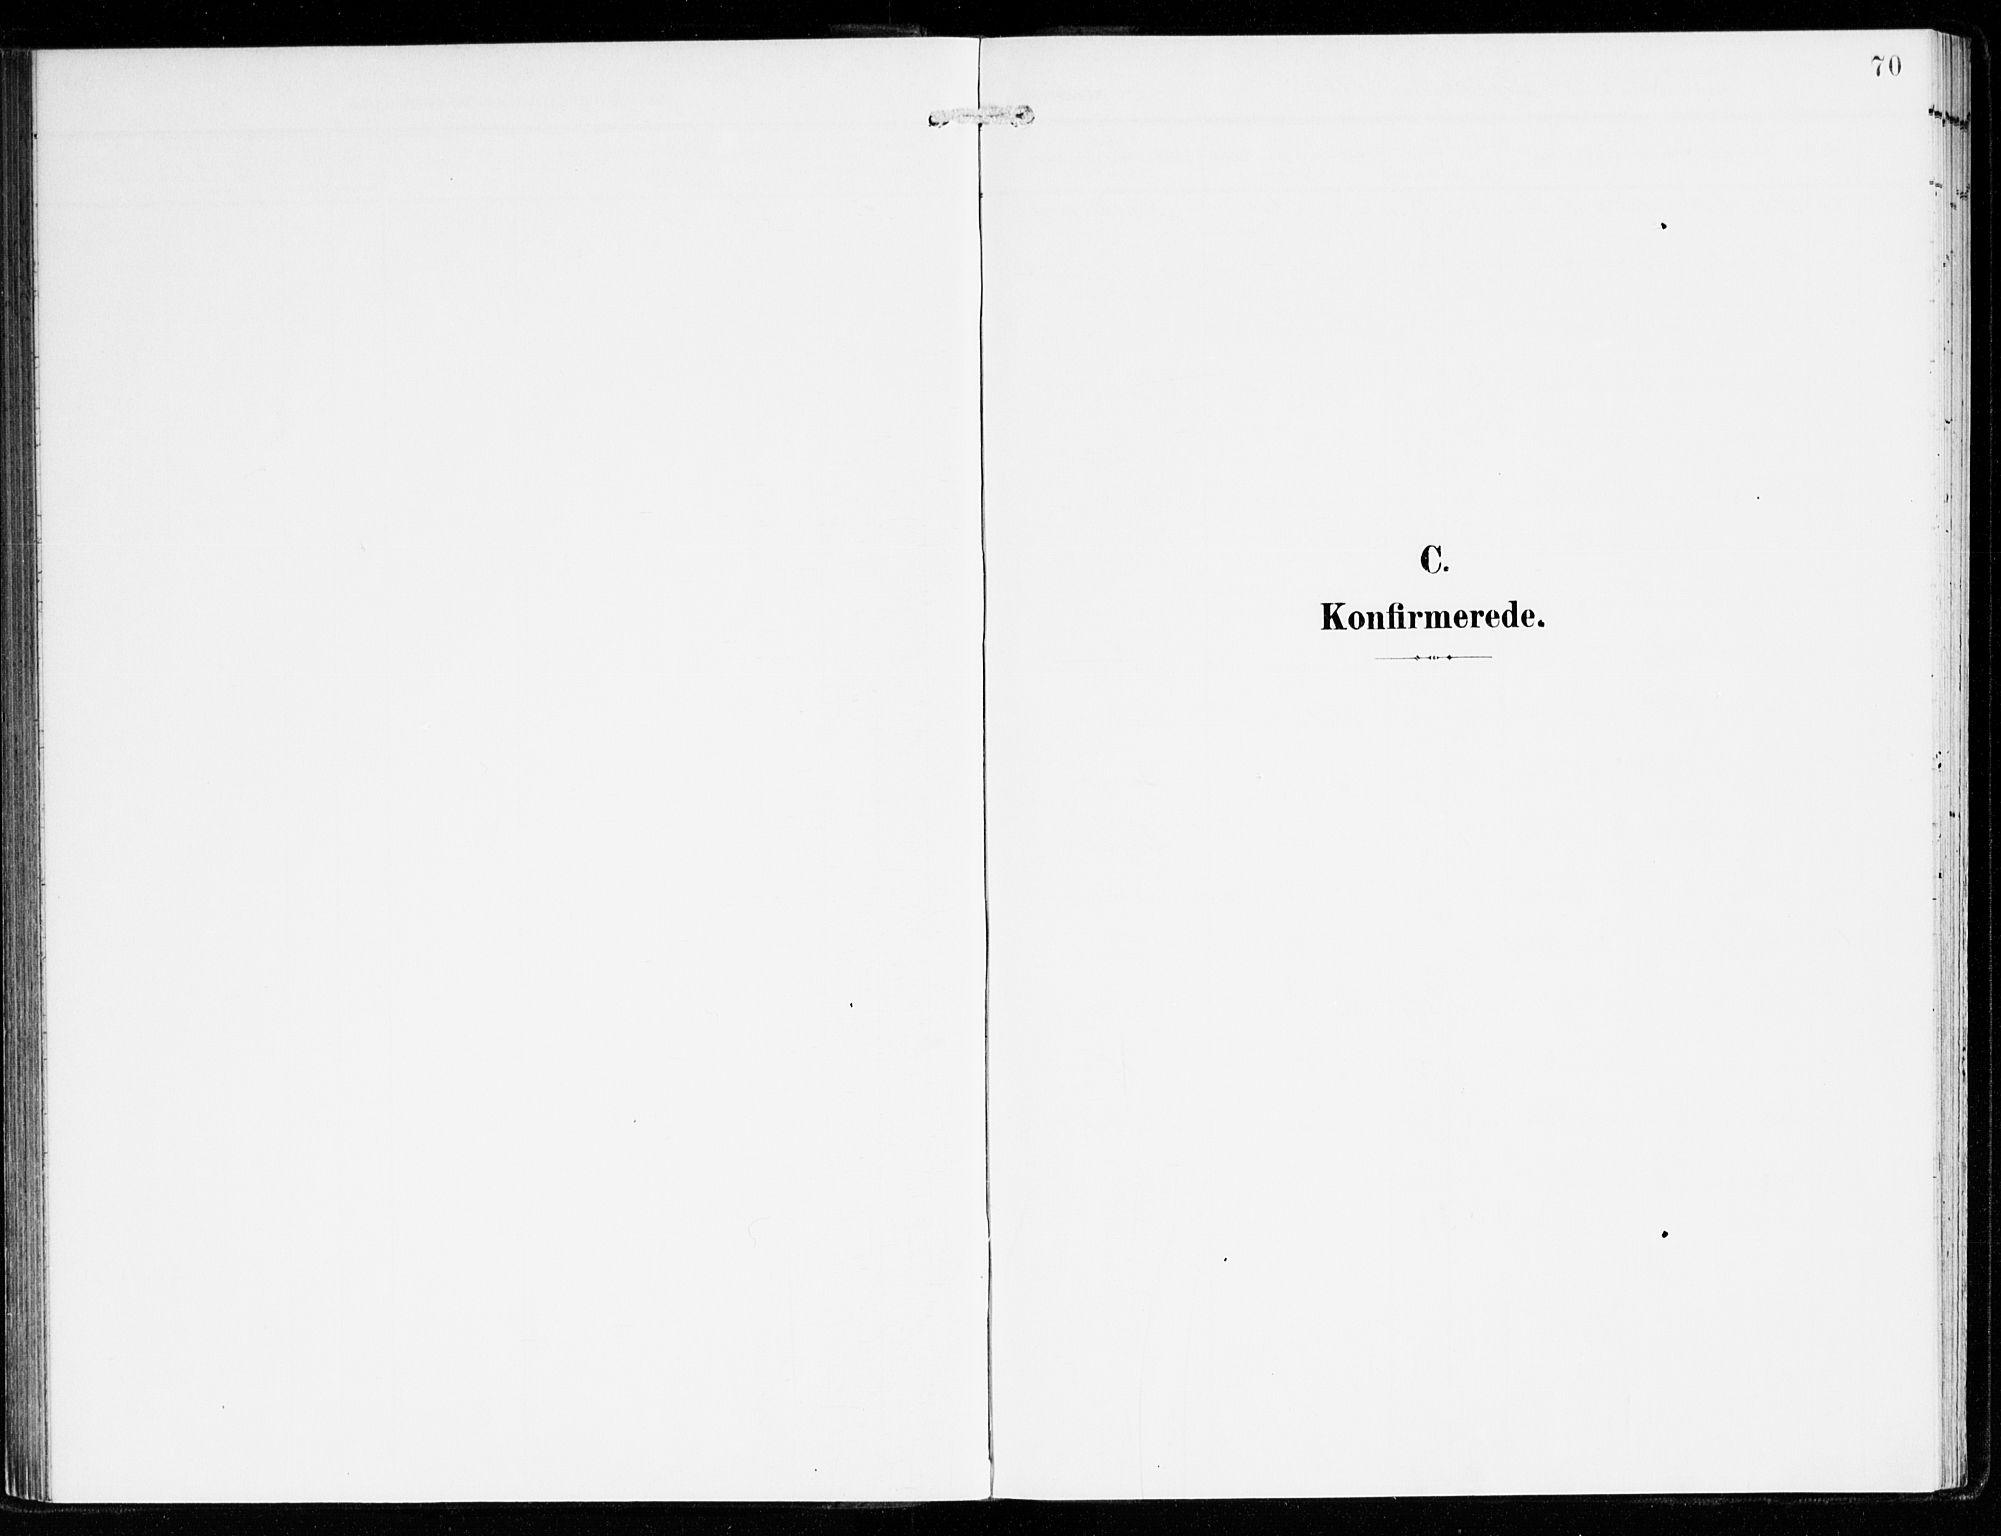 SAB, Hyllestad Sokneprestembete, Ministerialbok nr. B 2, 1903-1917, s. 70